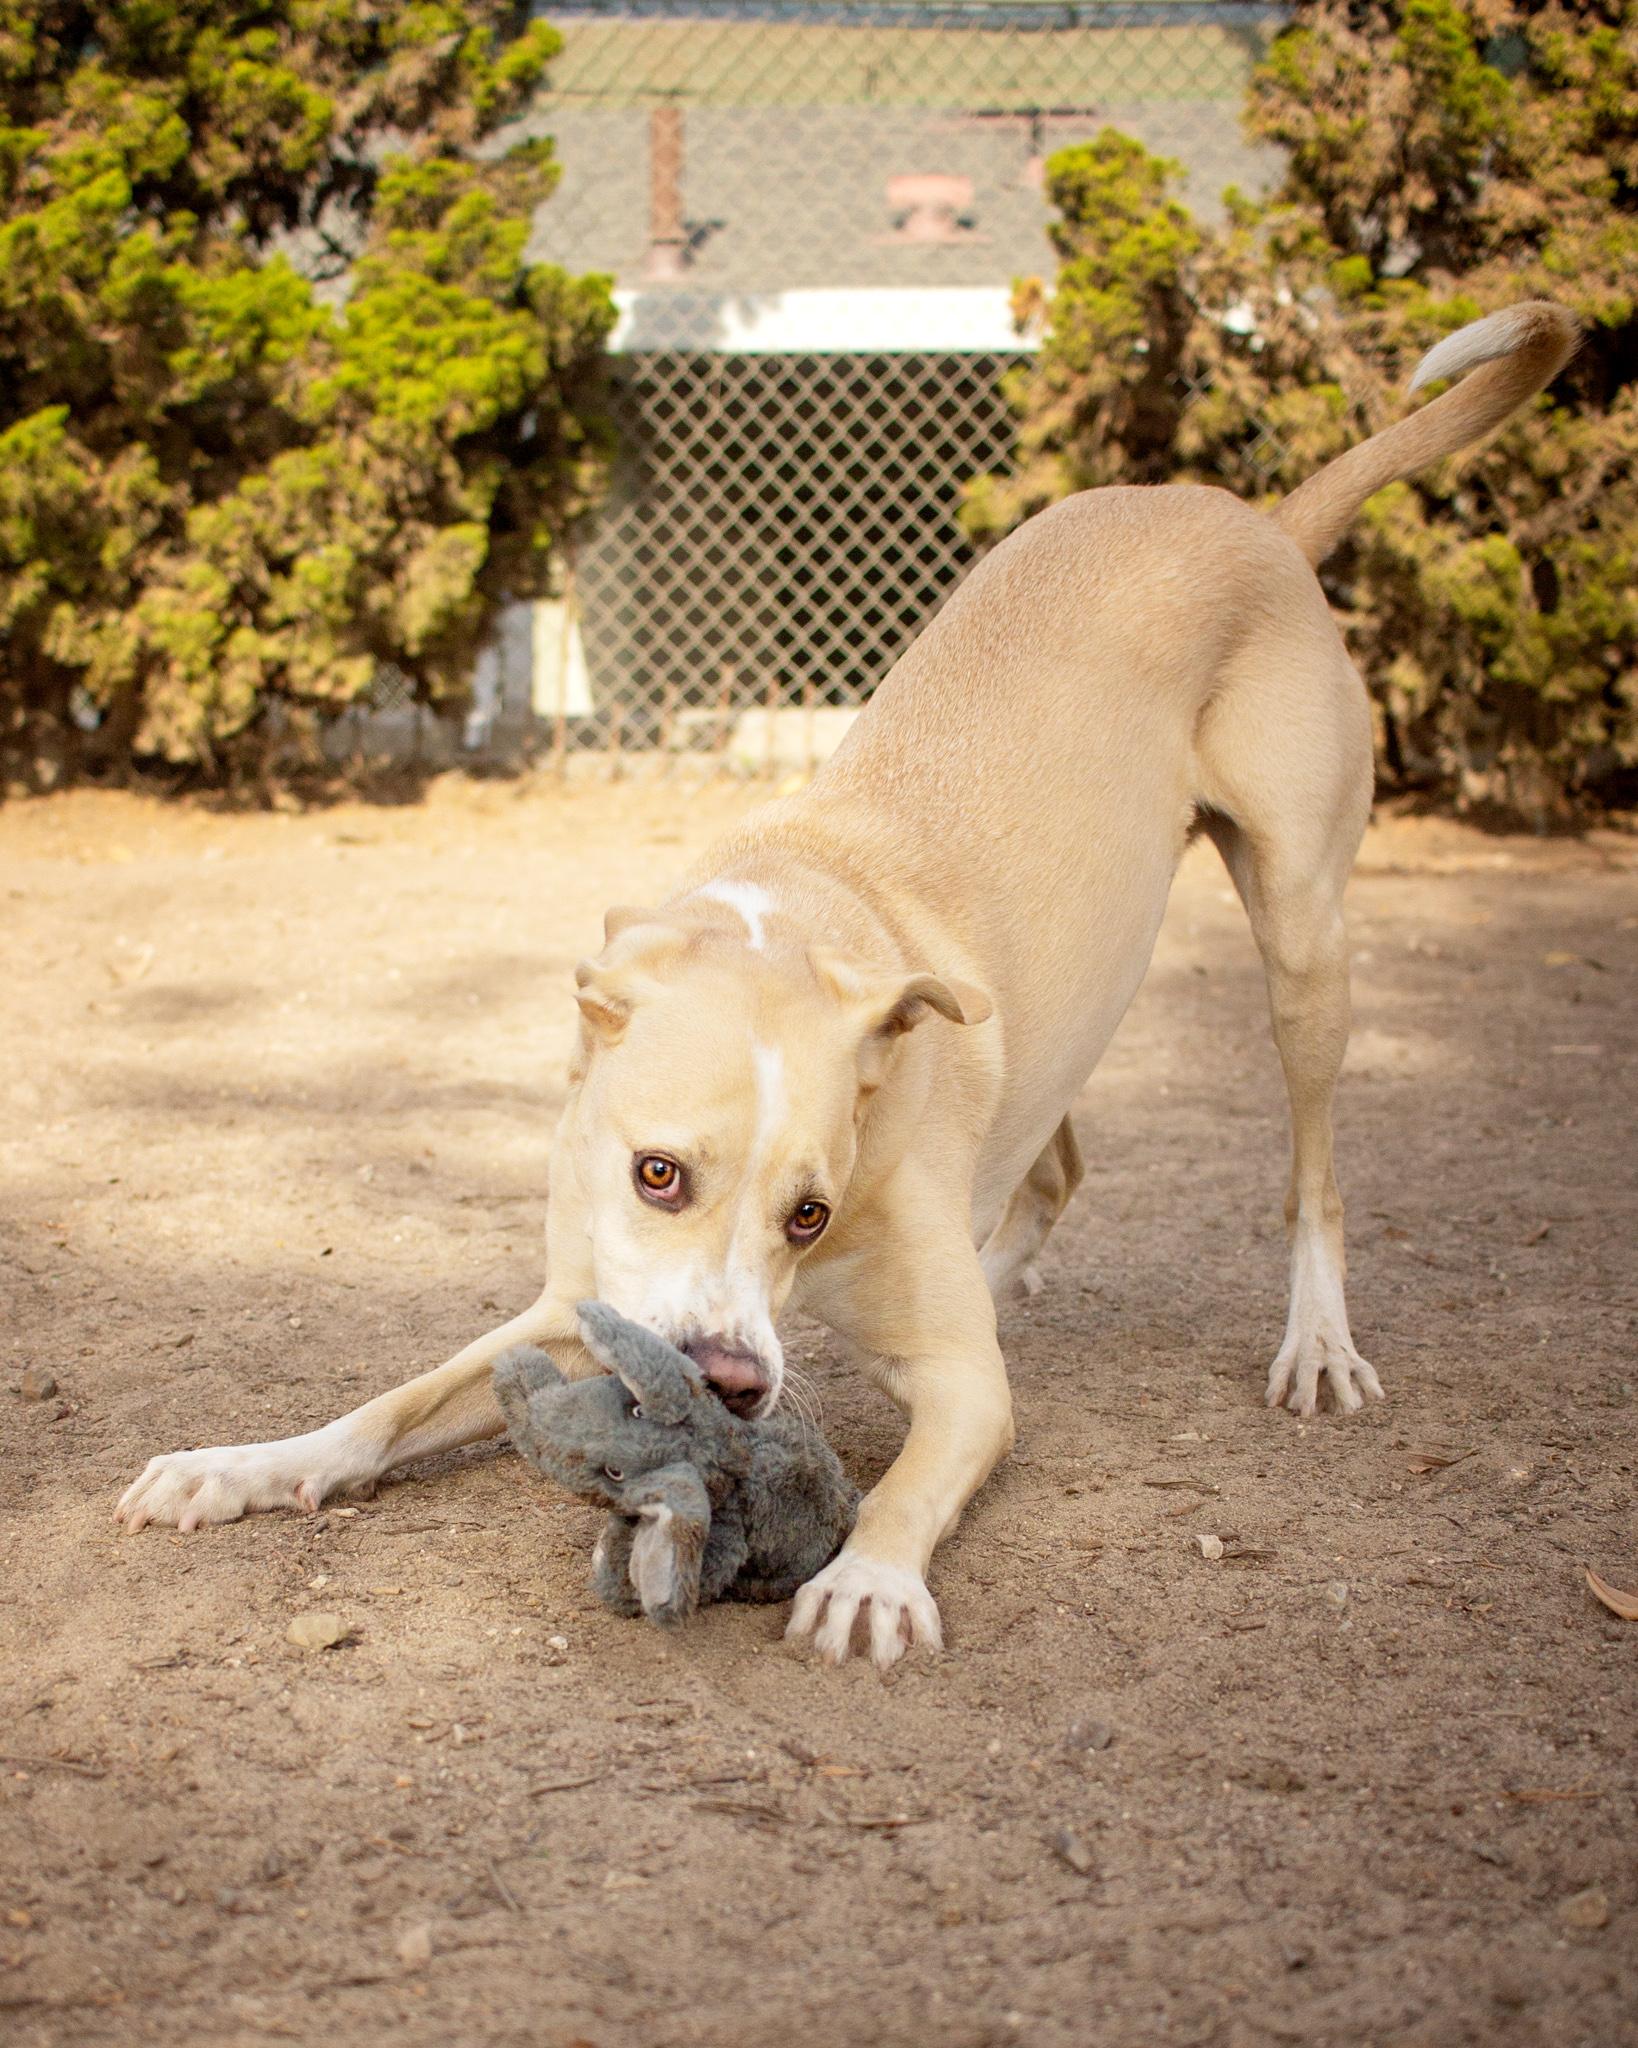 513-Orange-County-Dog-Photography-Steamer-Lee-Southern-California-SBACC.JPG